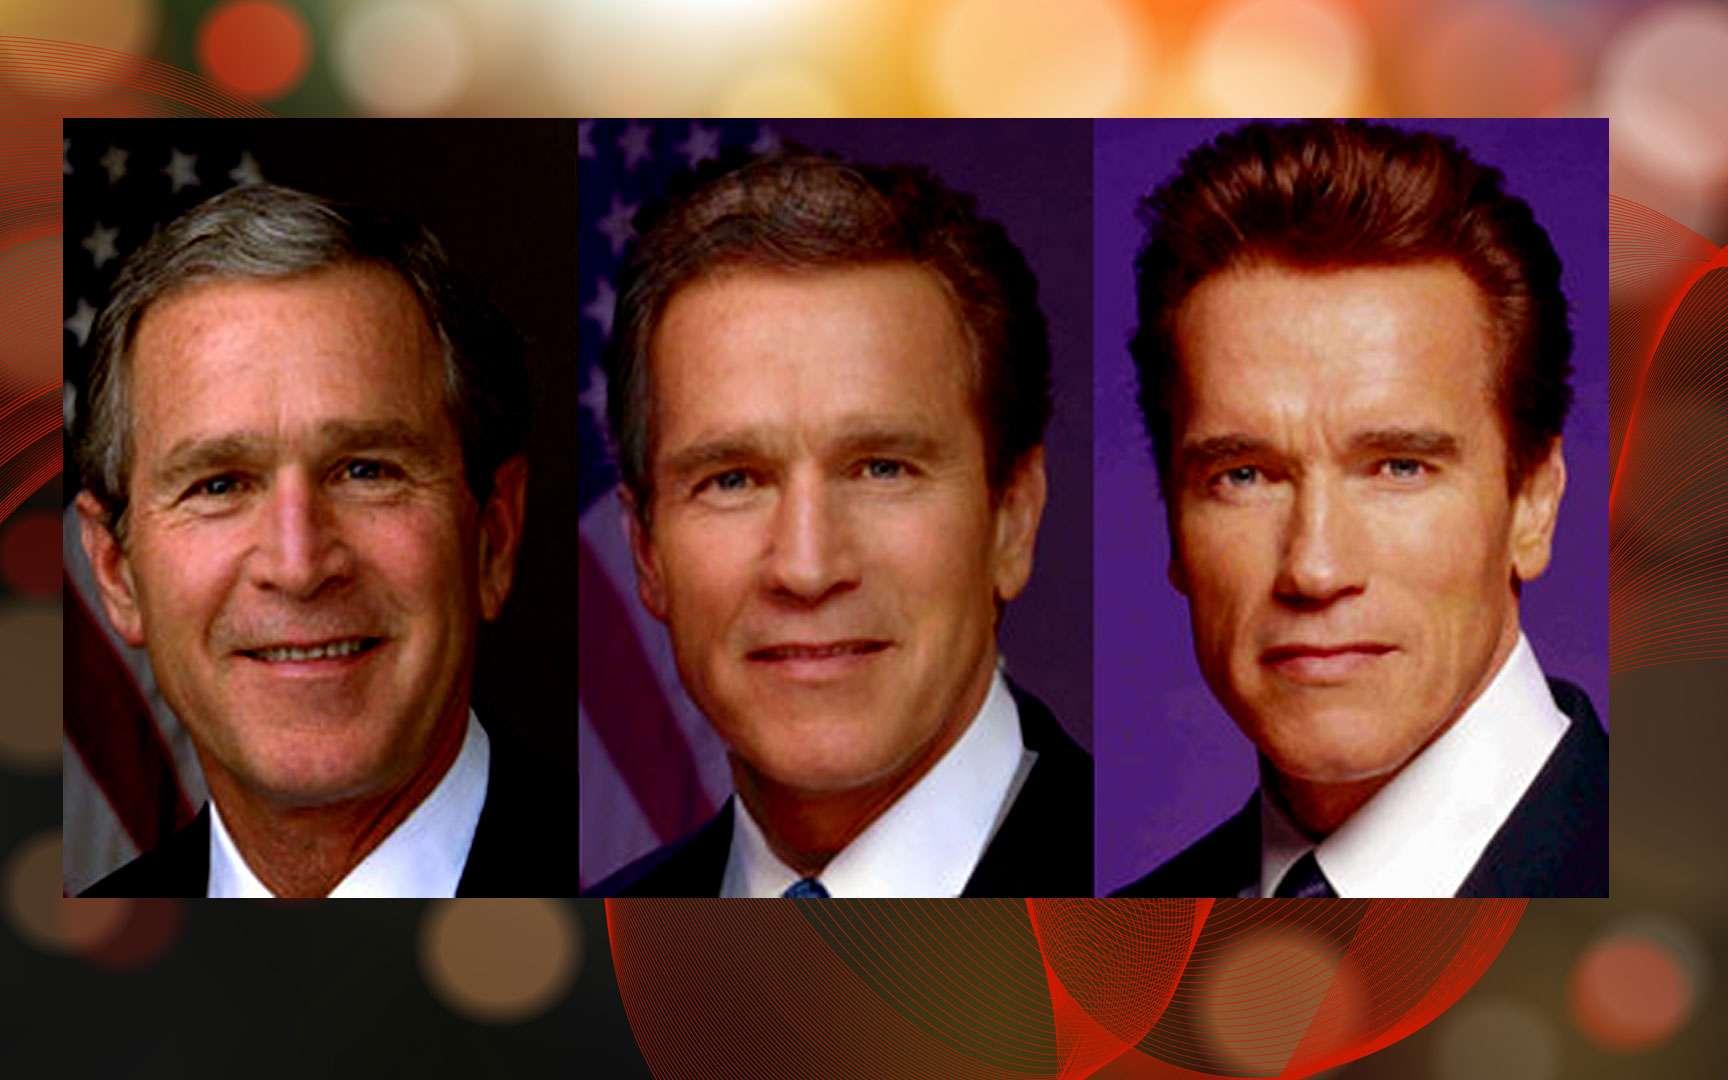 Morphing : de George Bush à Arnold Schwarzenegger, Wikimedia commons, Lainf, DP